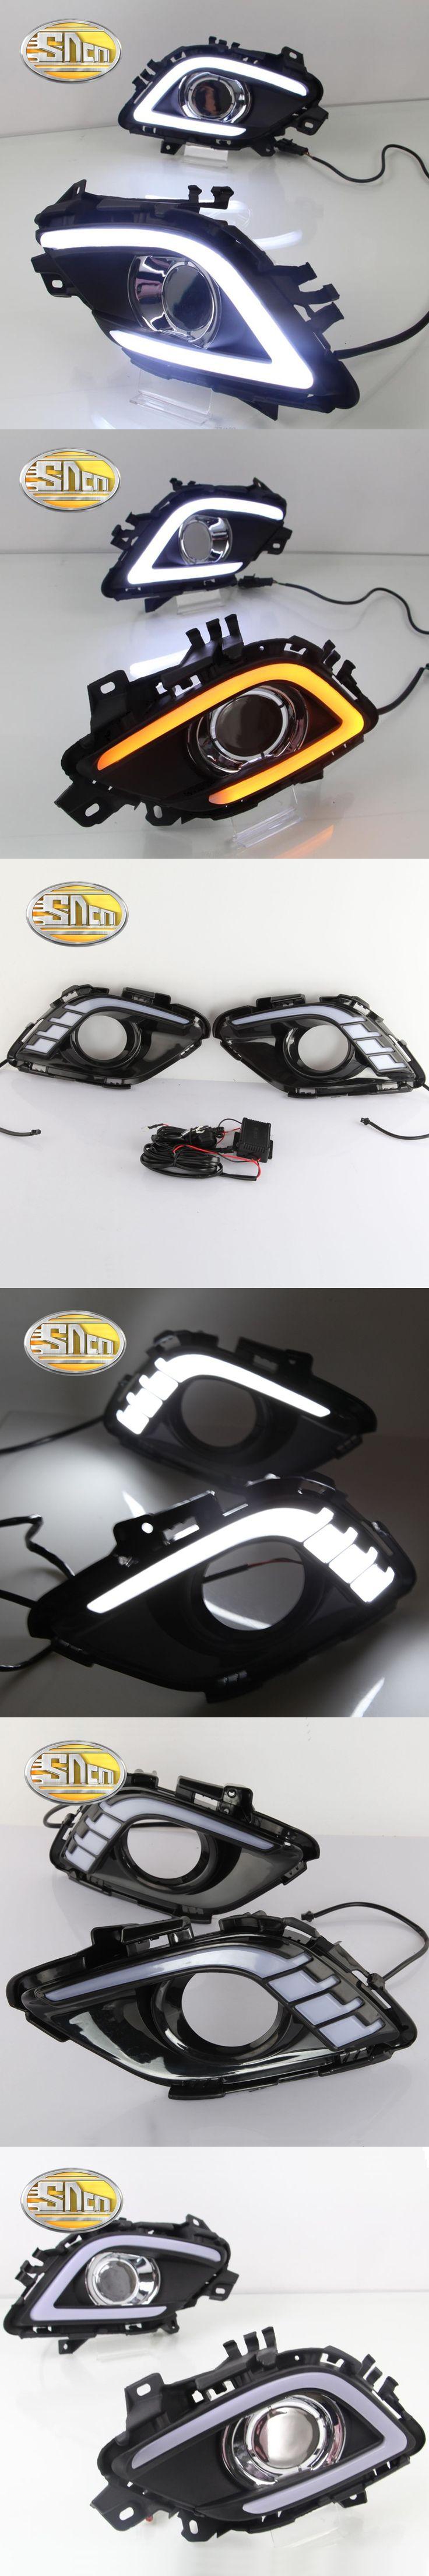 SNCN LED Daytime Running Light For Mazda 6 2013 2014 2015 2016,Car Accessories Waterproof ABS 12V DRL Fog Lamp Decoration